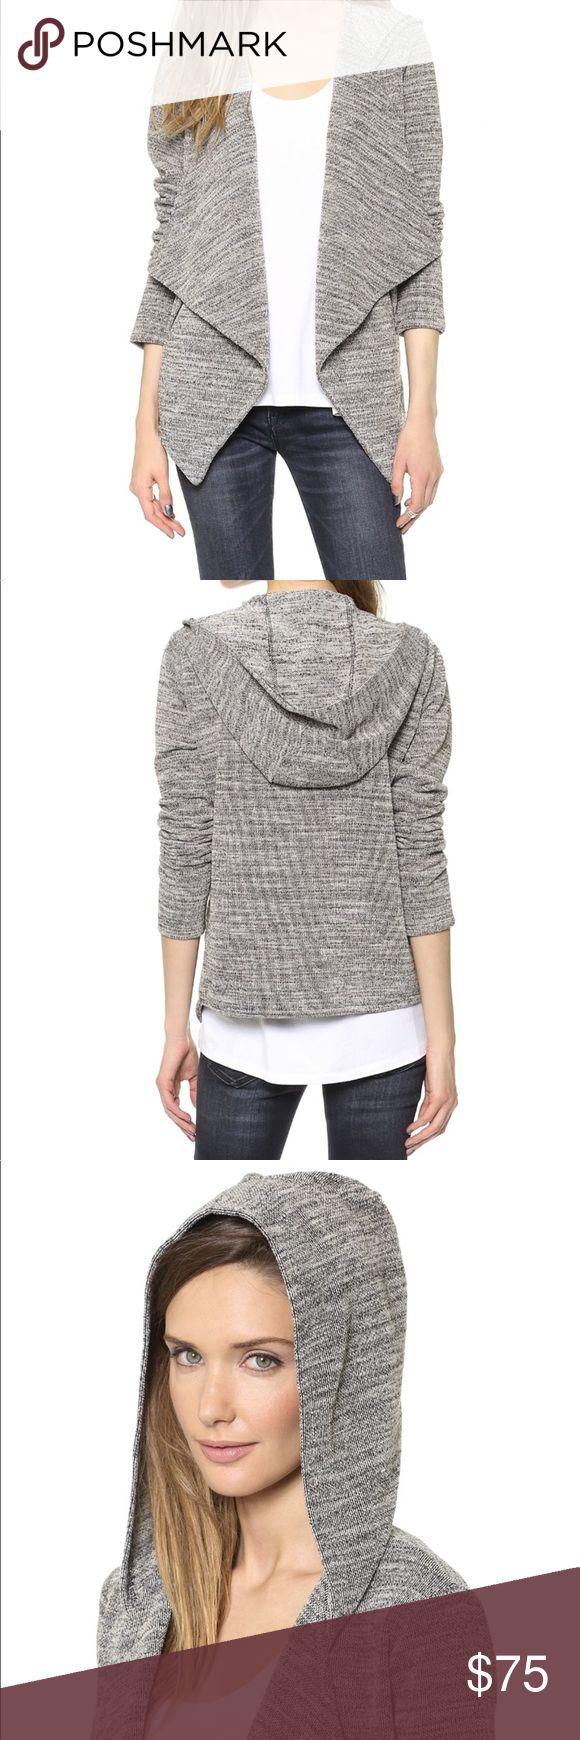 BB Dakota Corinna Hooded Jacket A draped open placket lends modern edge to this hooded jacket. Slant zip pockets detail the front. Long sleeves. Unlined. Size medium. BB Dakota Jackets & Coats